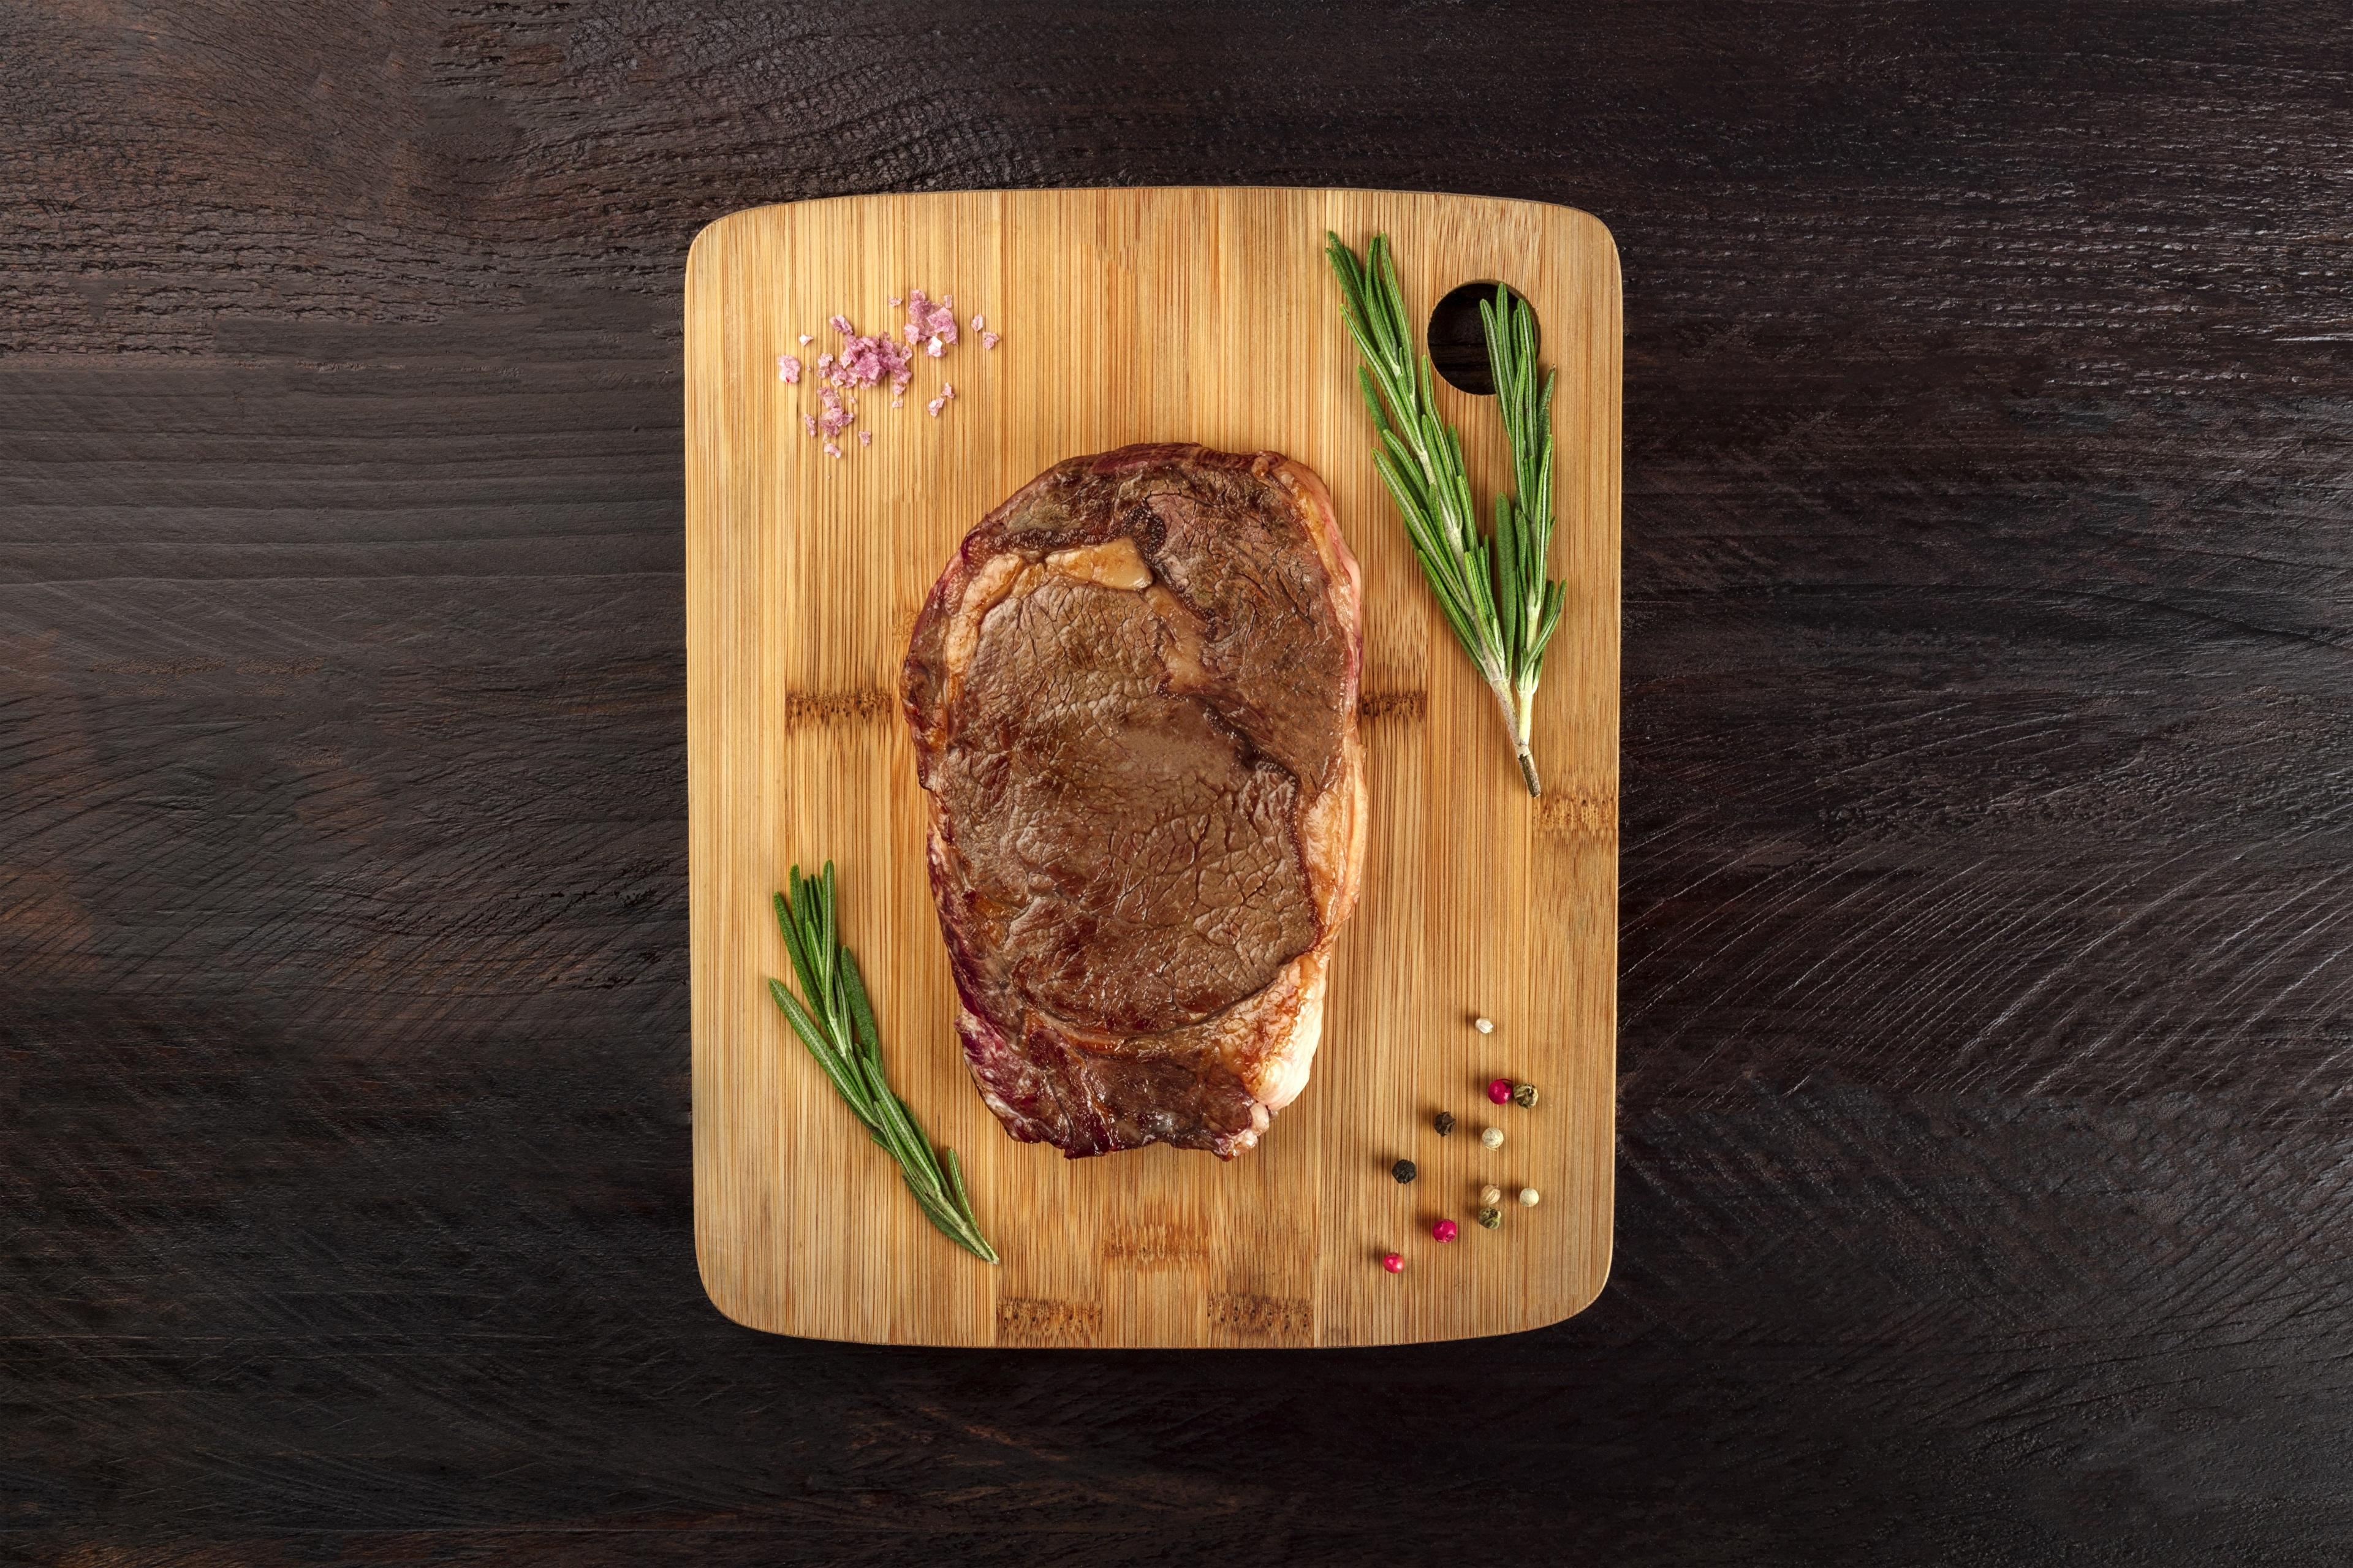 ,肉類產品,rosemary,砧板,食品,食物,